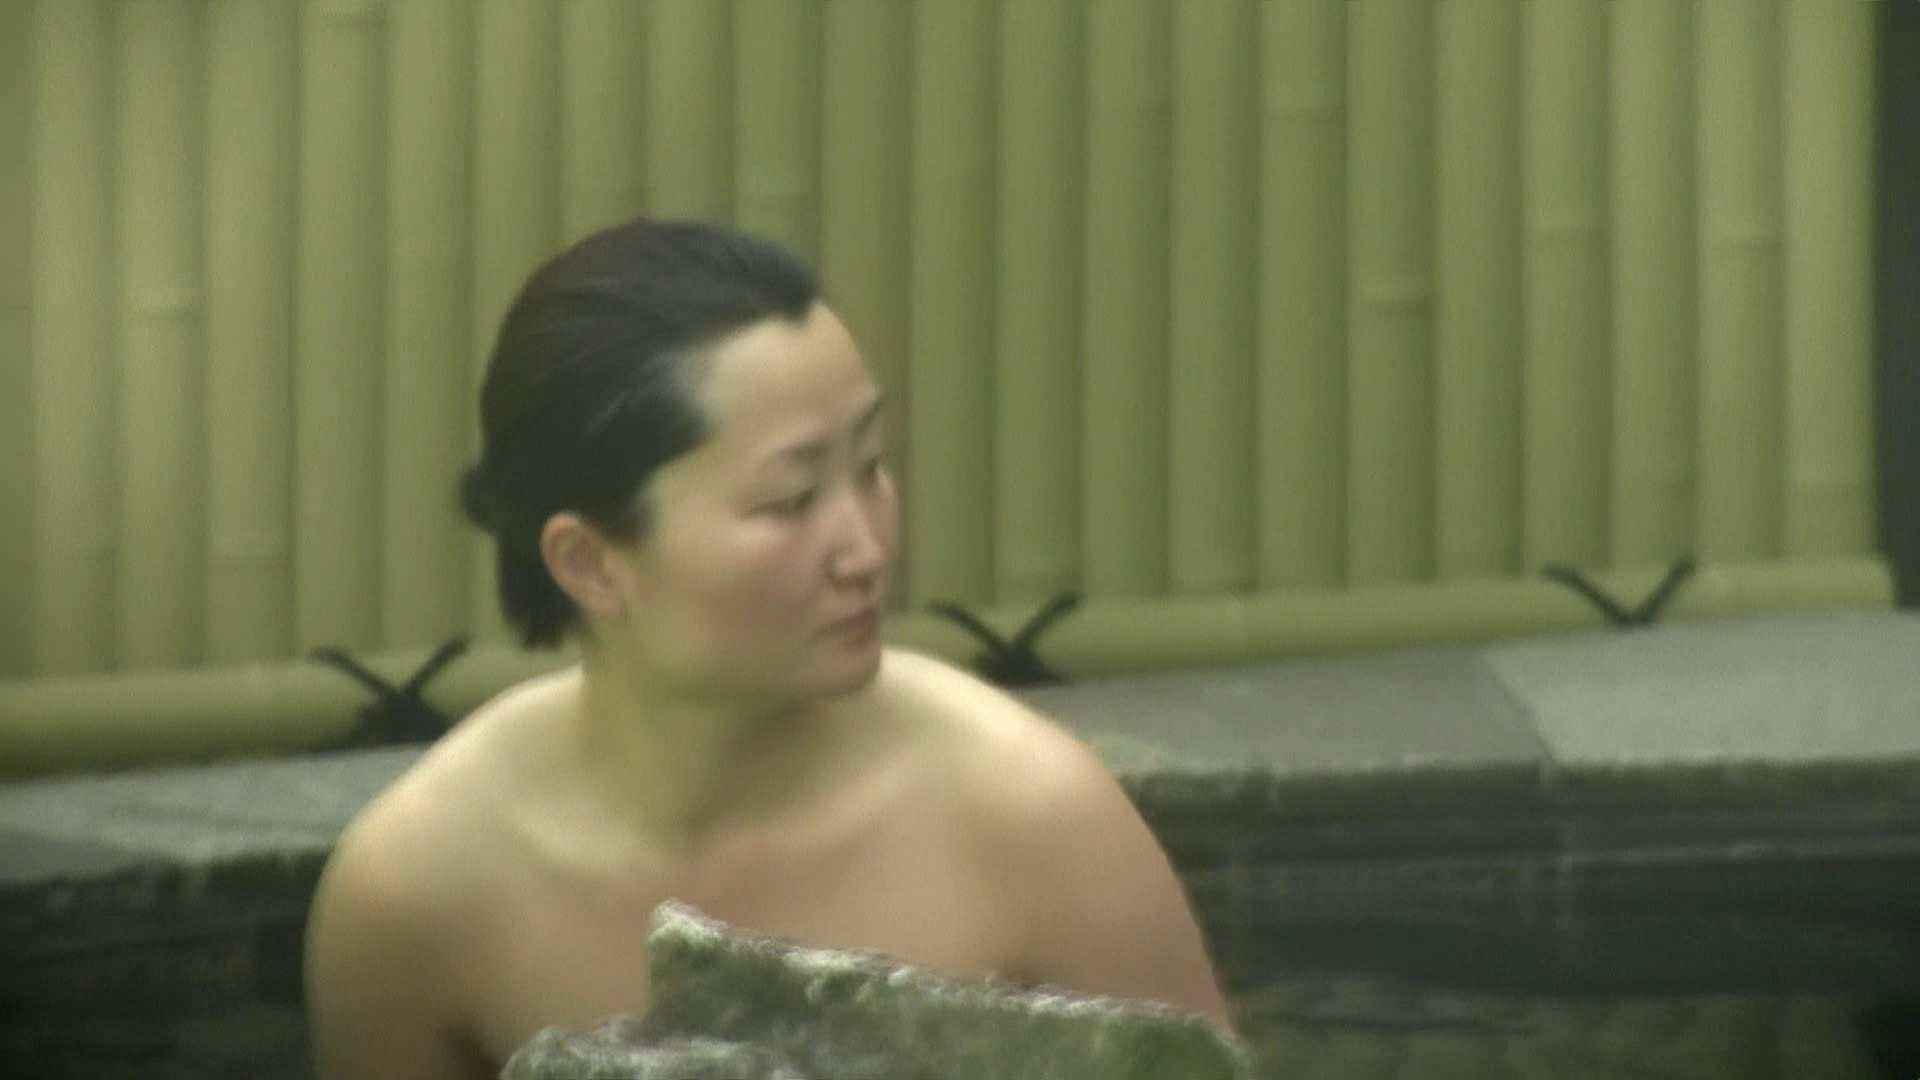 Aquaな露天風呂Vol.632 盗撮 | OLセックス  70画像 4